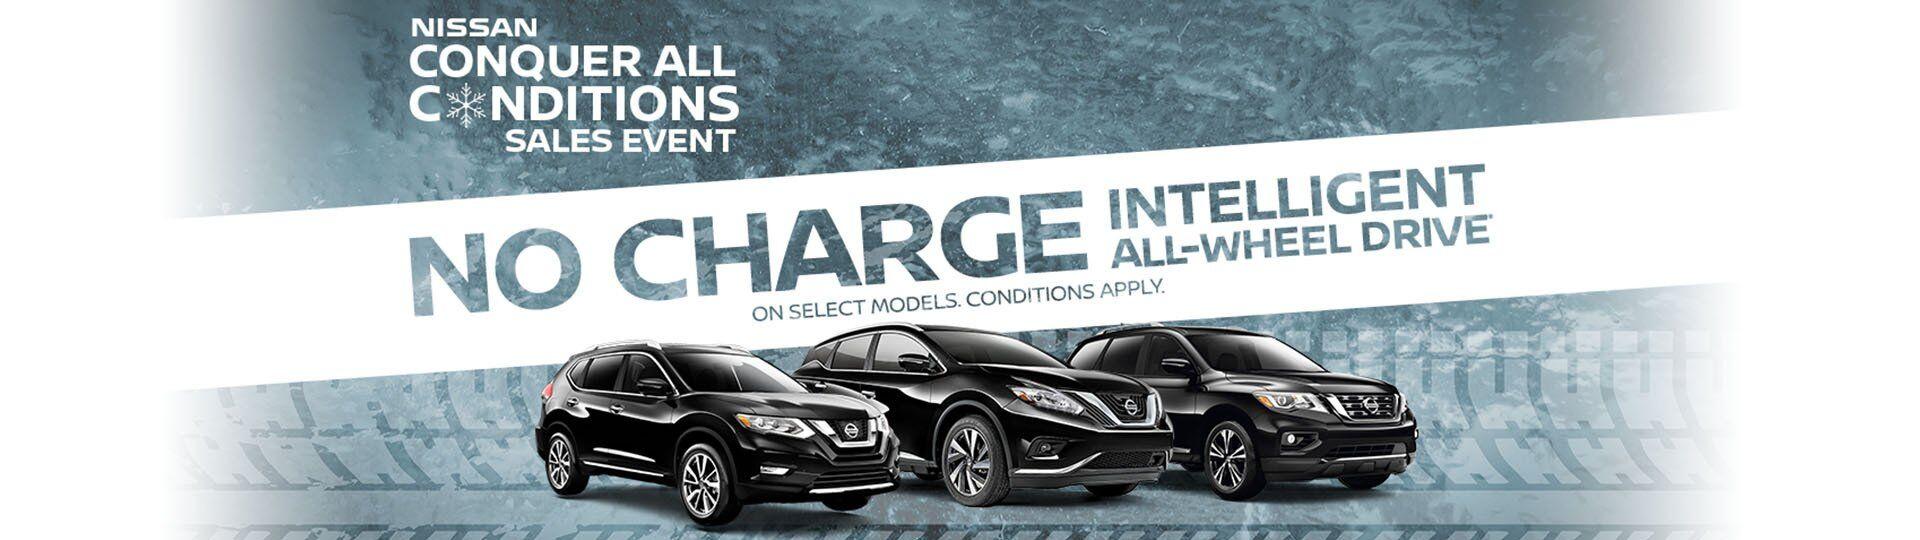 Dilawri Group Used Cars Winnipeg